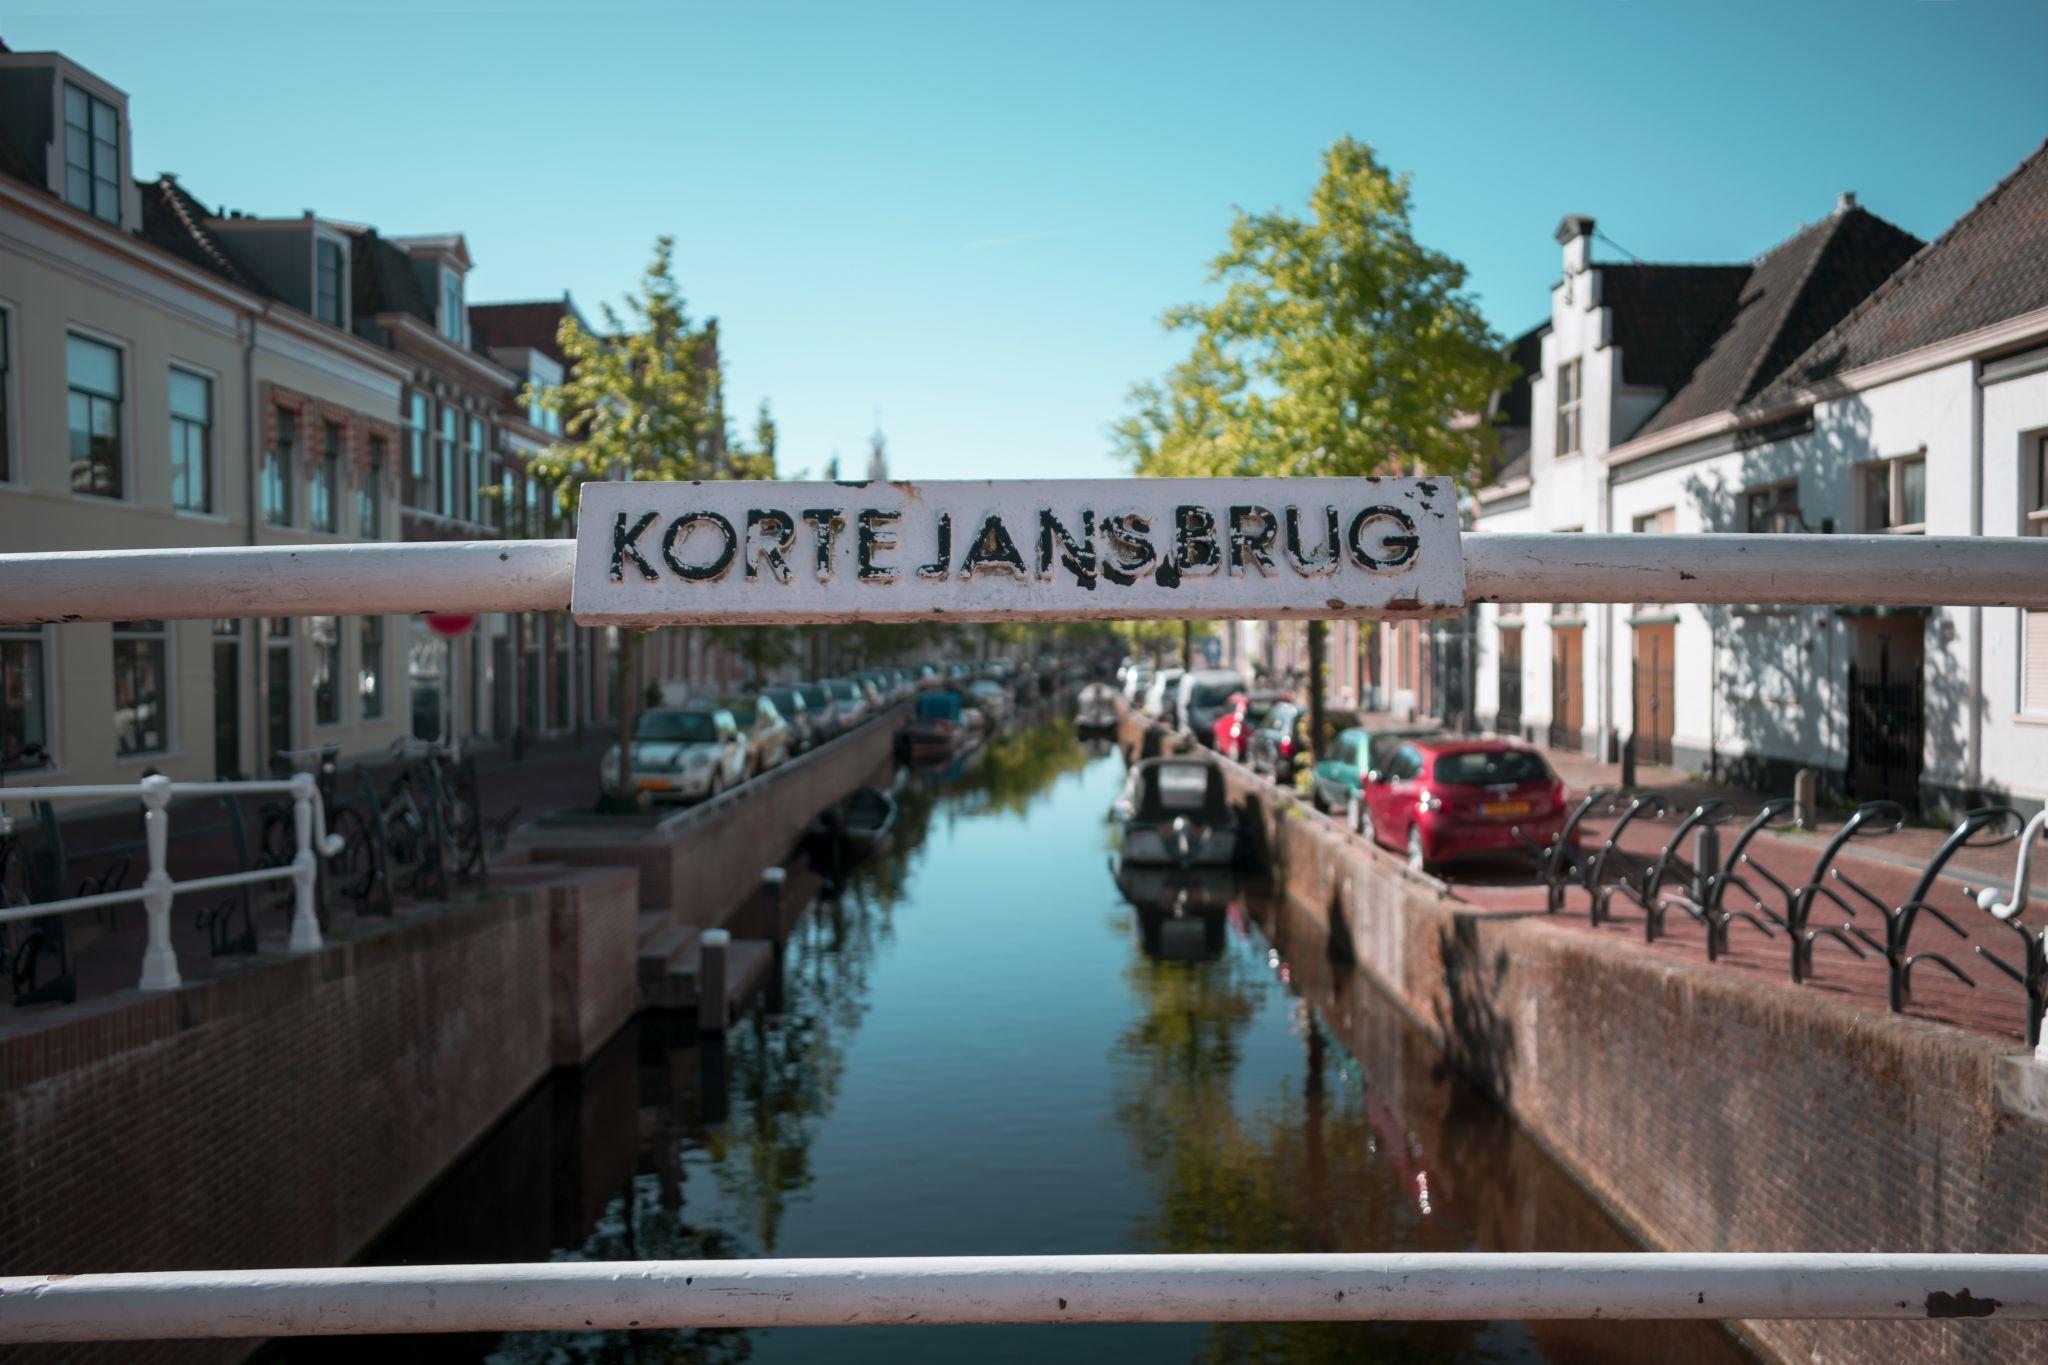 Korte Jansburg, Netherlands